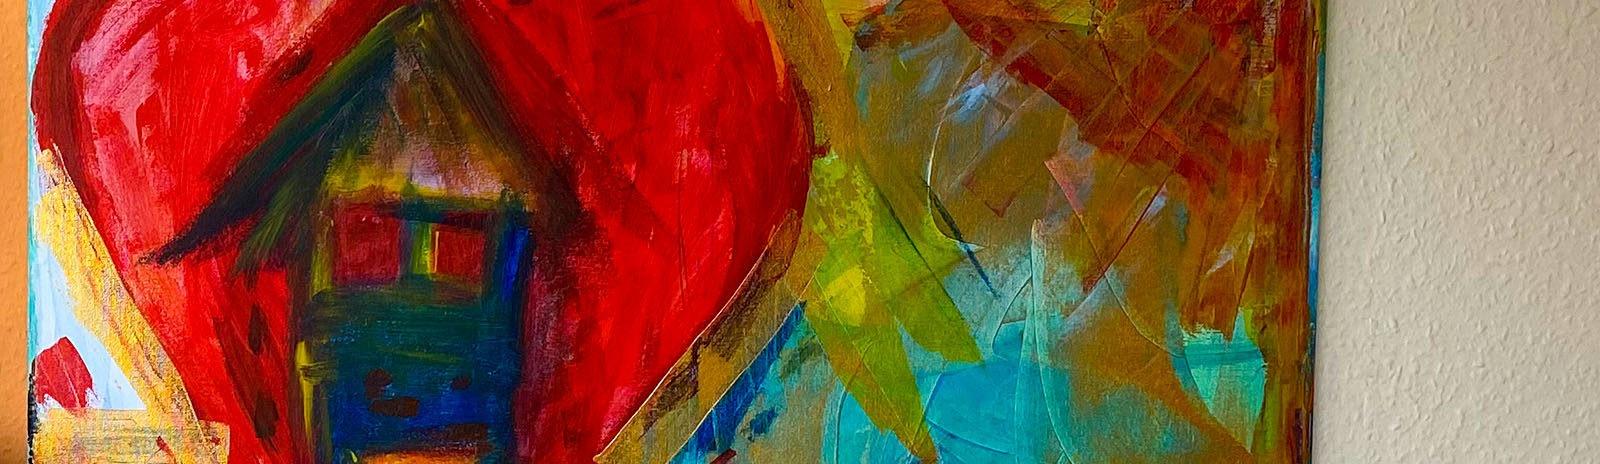 Laurentiushöhe_Kunstwettbewerb_slider